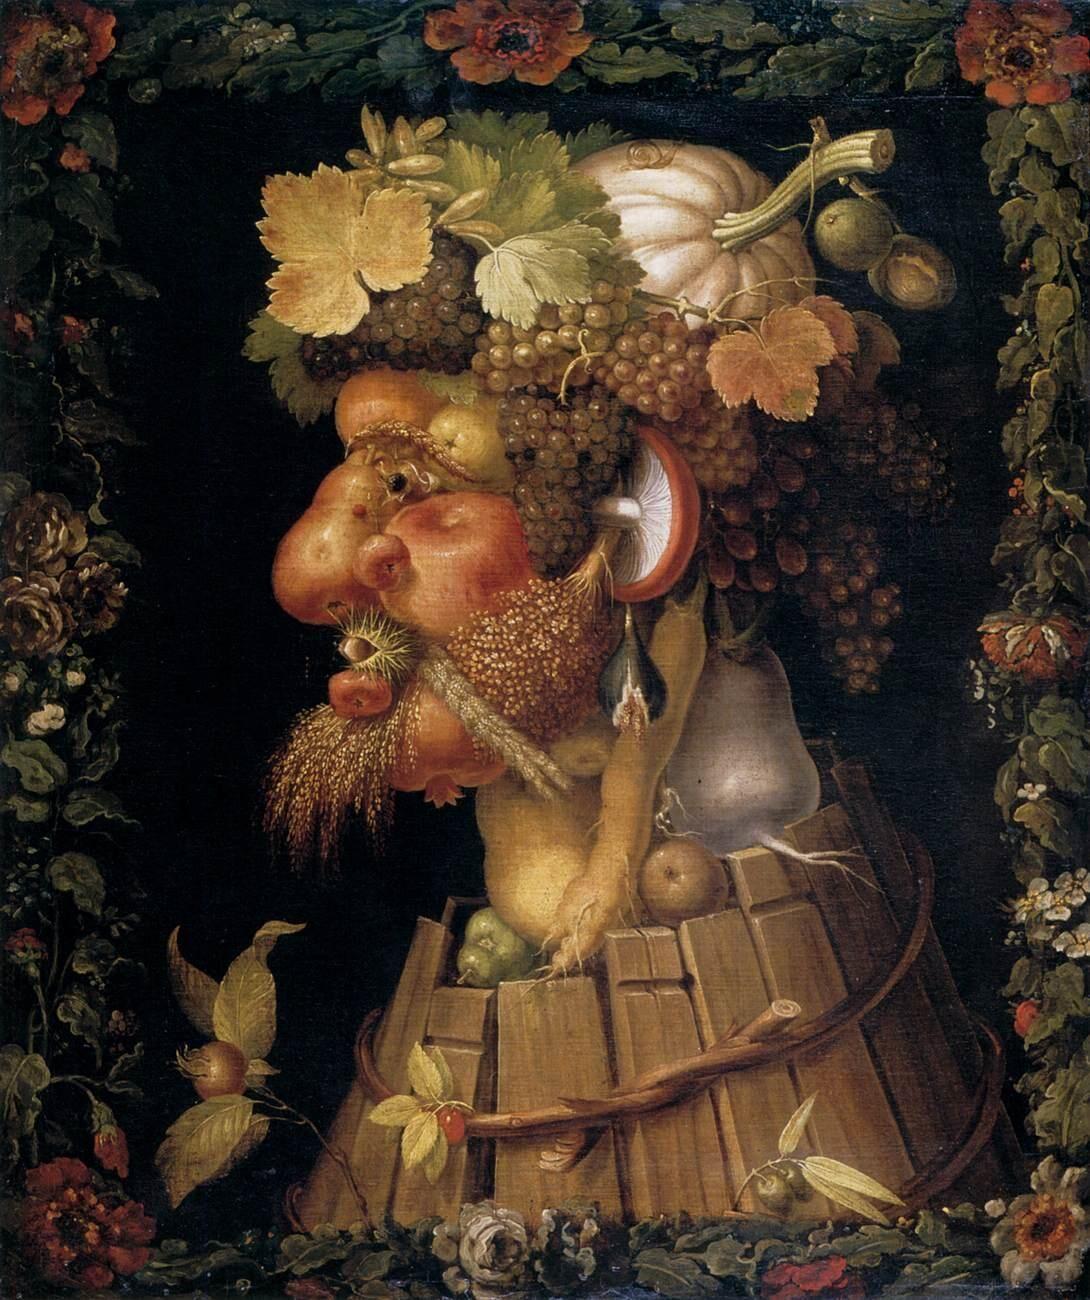 Giuseppe Arcimboldo, otoño de 1573. Foto a través de Wikimedia Commons.